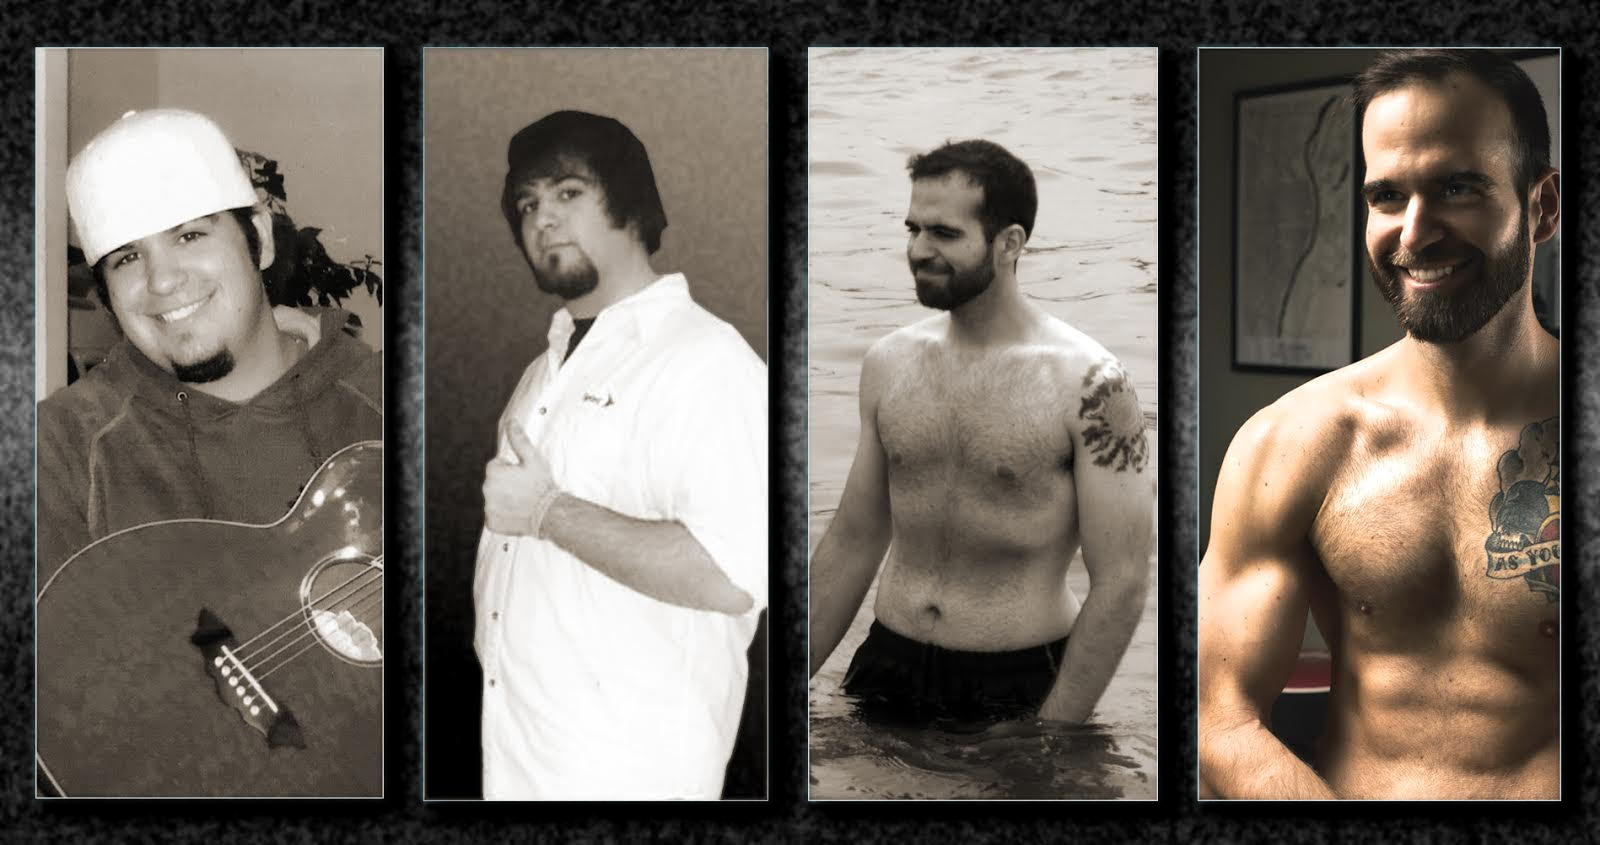 Spencer progress photos